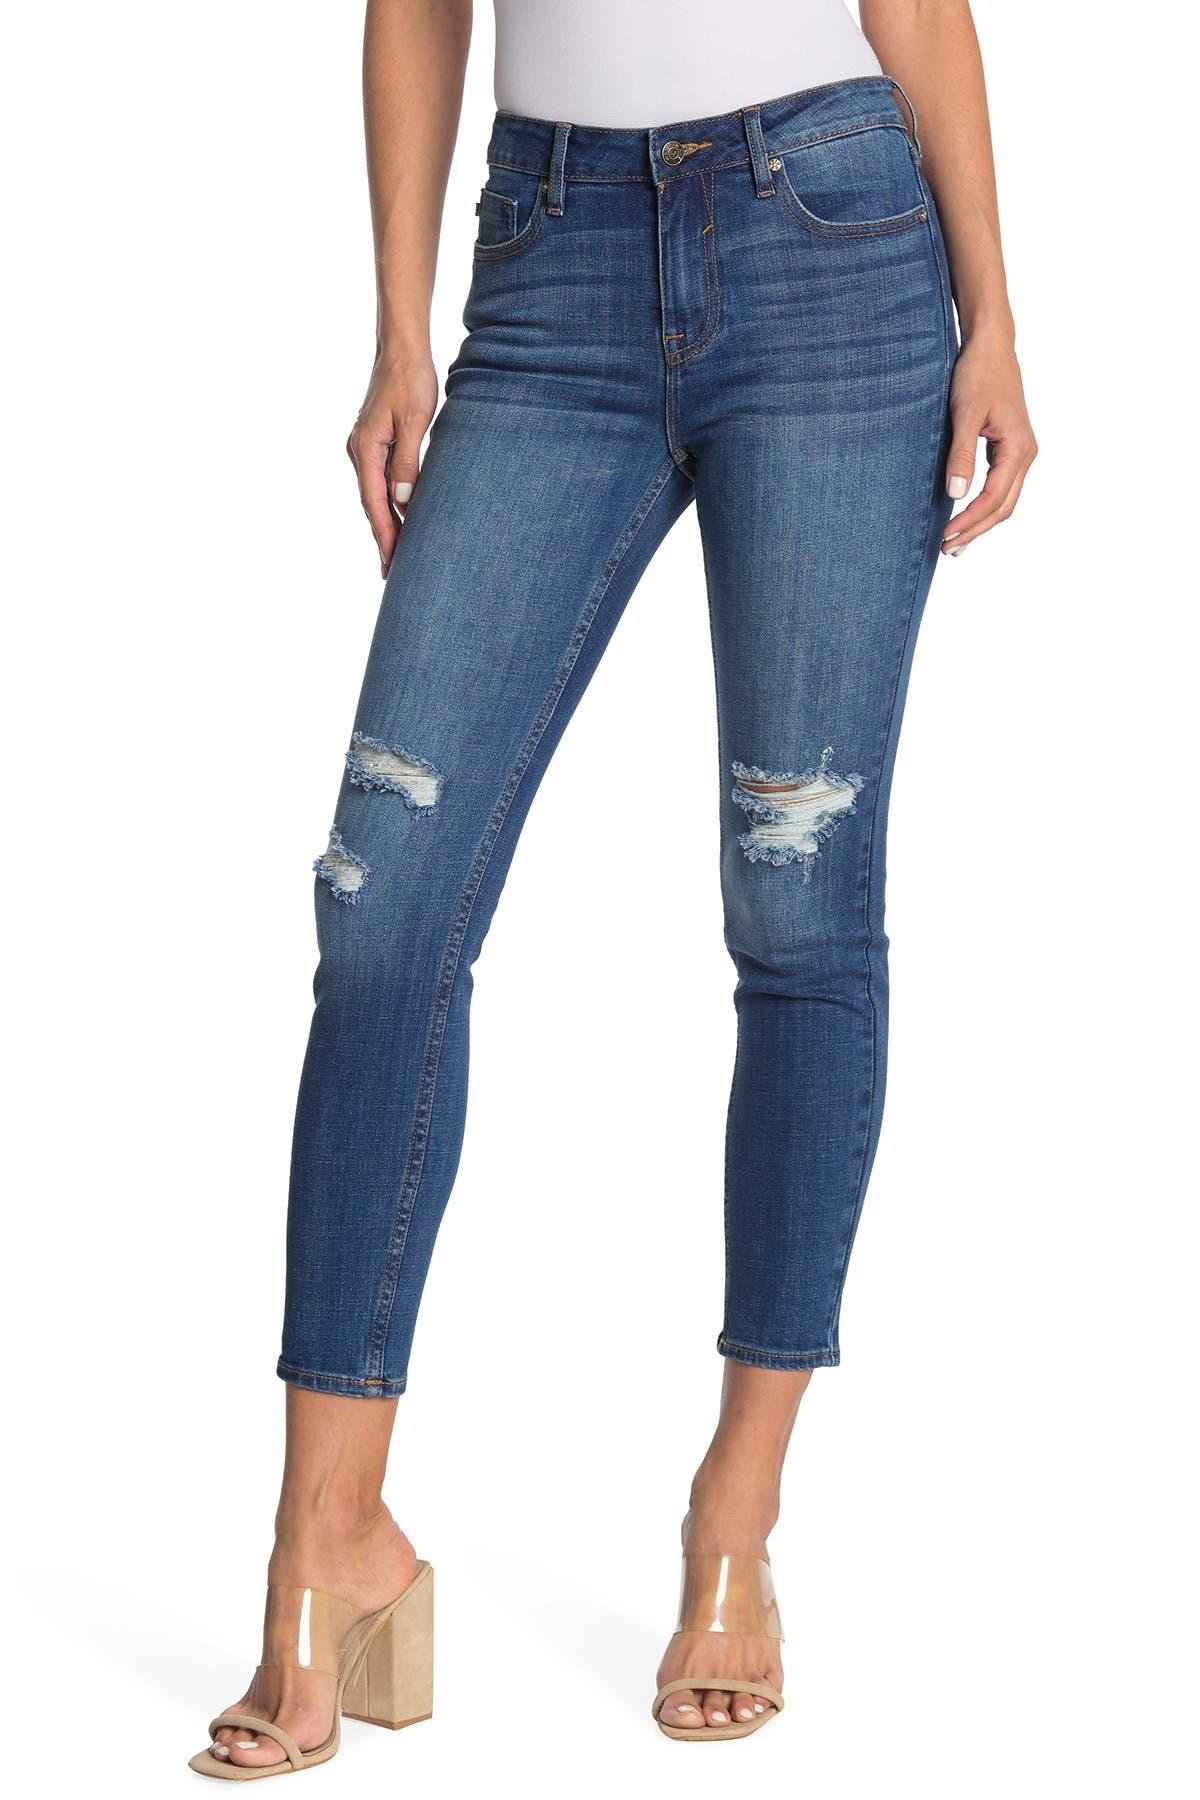 Image of Vigoss Marley Mid Rise Destructed Skinny Jeans